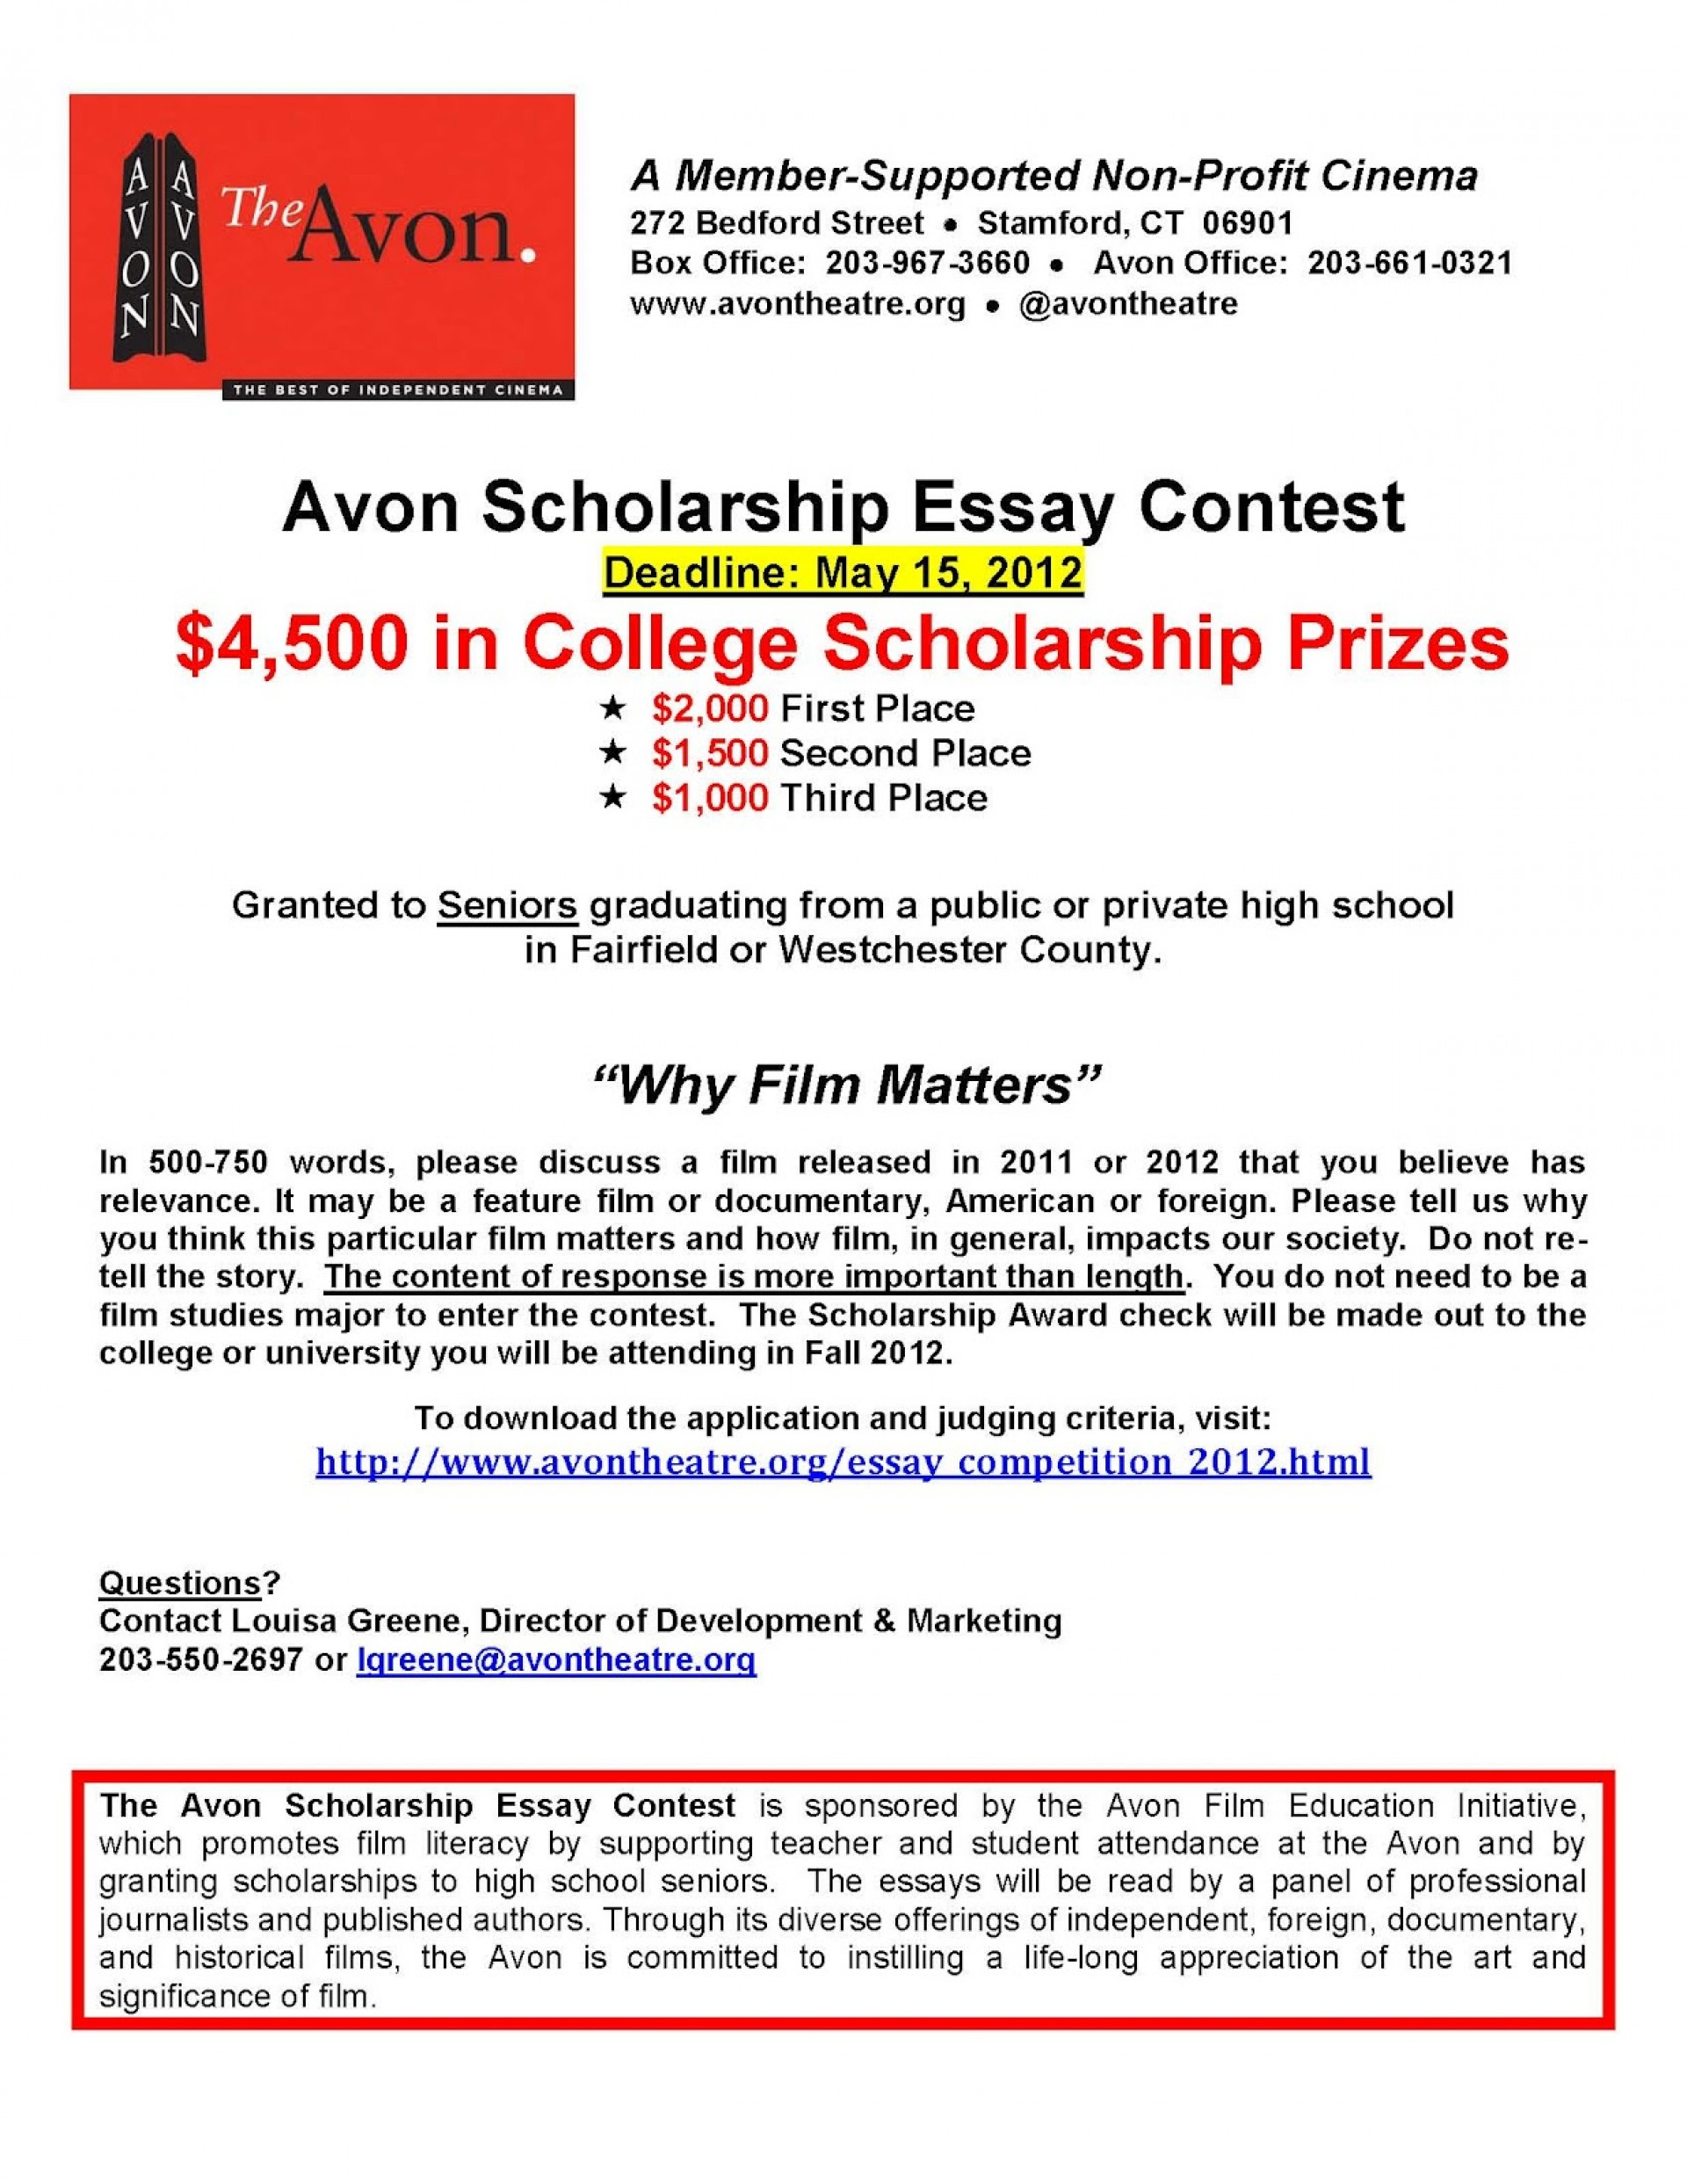 003 Non Essay Scholarships Example No College Scholarship Prowler Free For High School Seniors Avonscholarshipessaycontest2012 In Texas California Class Of Short Imposing Freshman Students 2019 1920